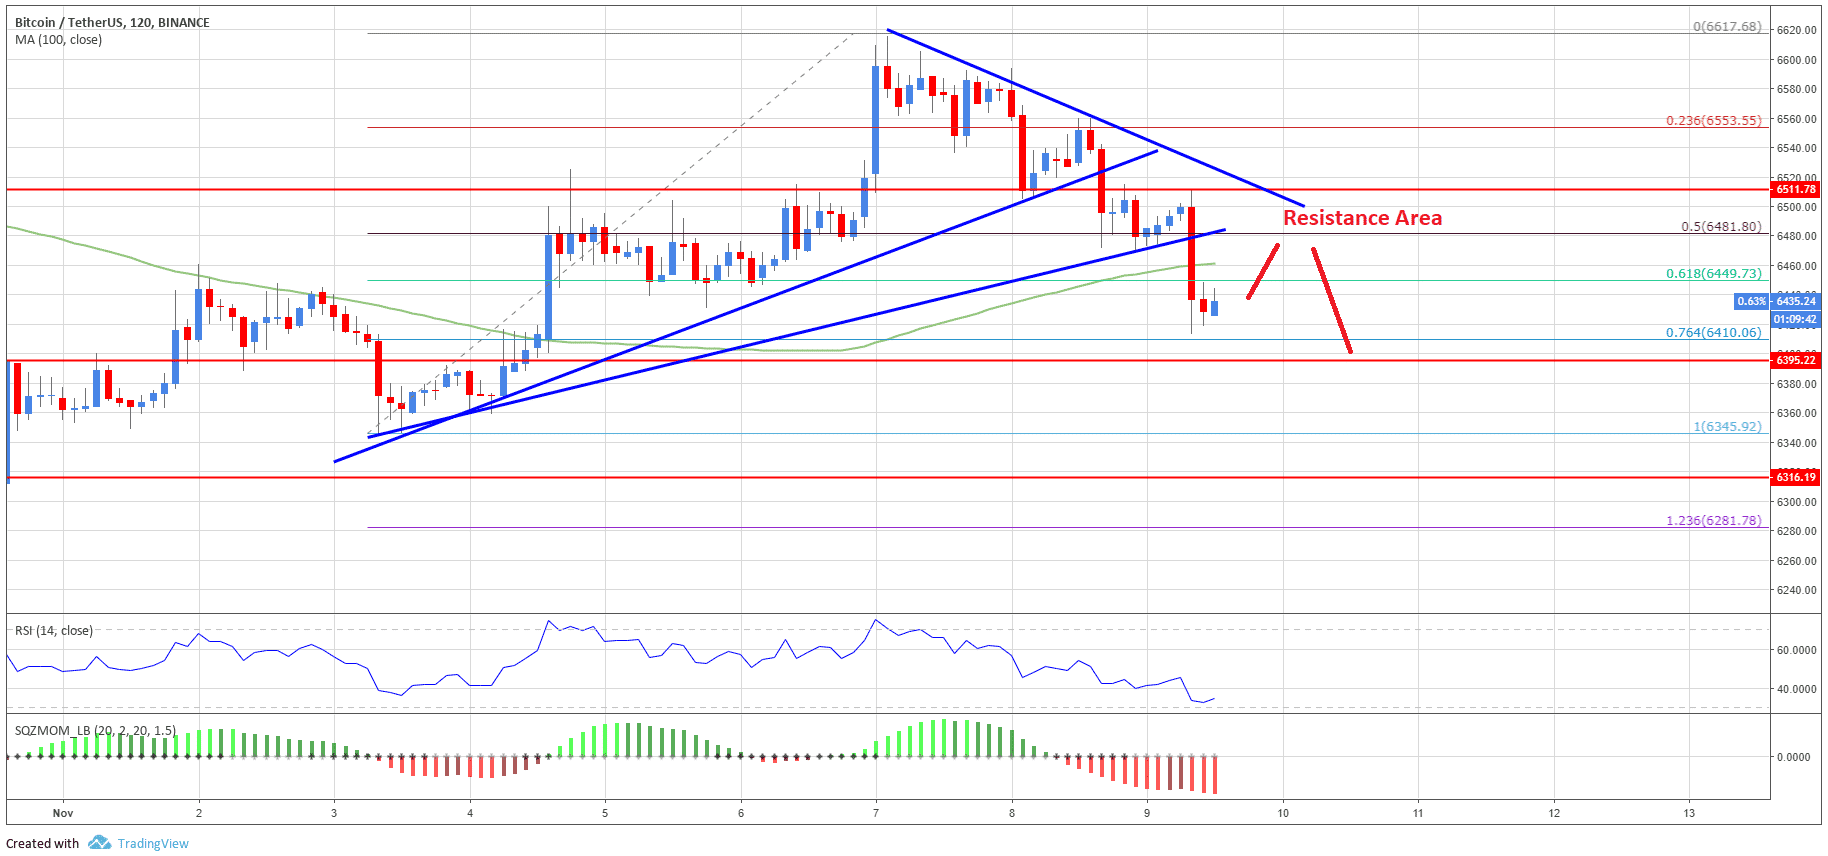 Bitcoin Price Analysis: BTC/USD Turned Short Term Bearish